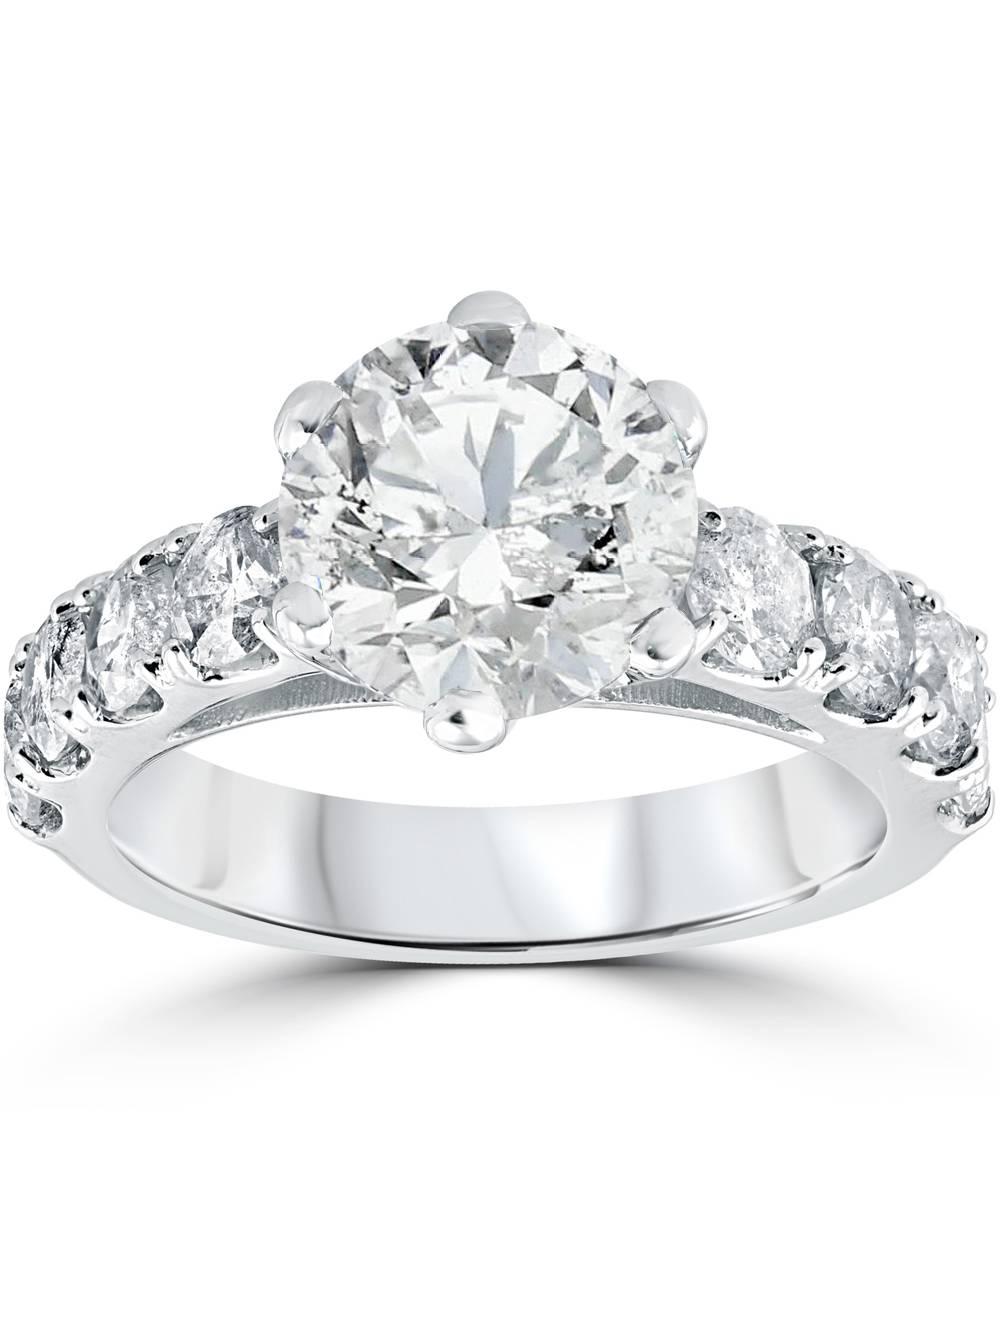 4 1 2 cttw Diamond Engagement Ring 14k White Gold Enhanced by Pompeii3